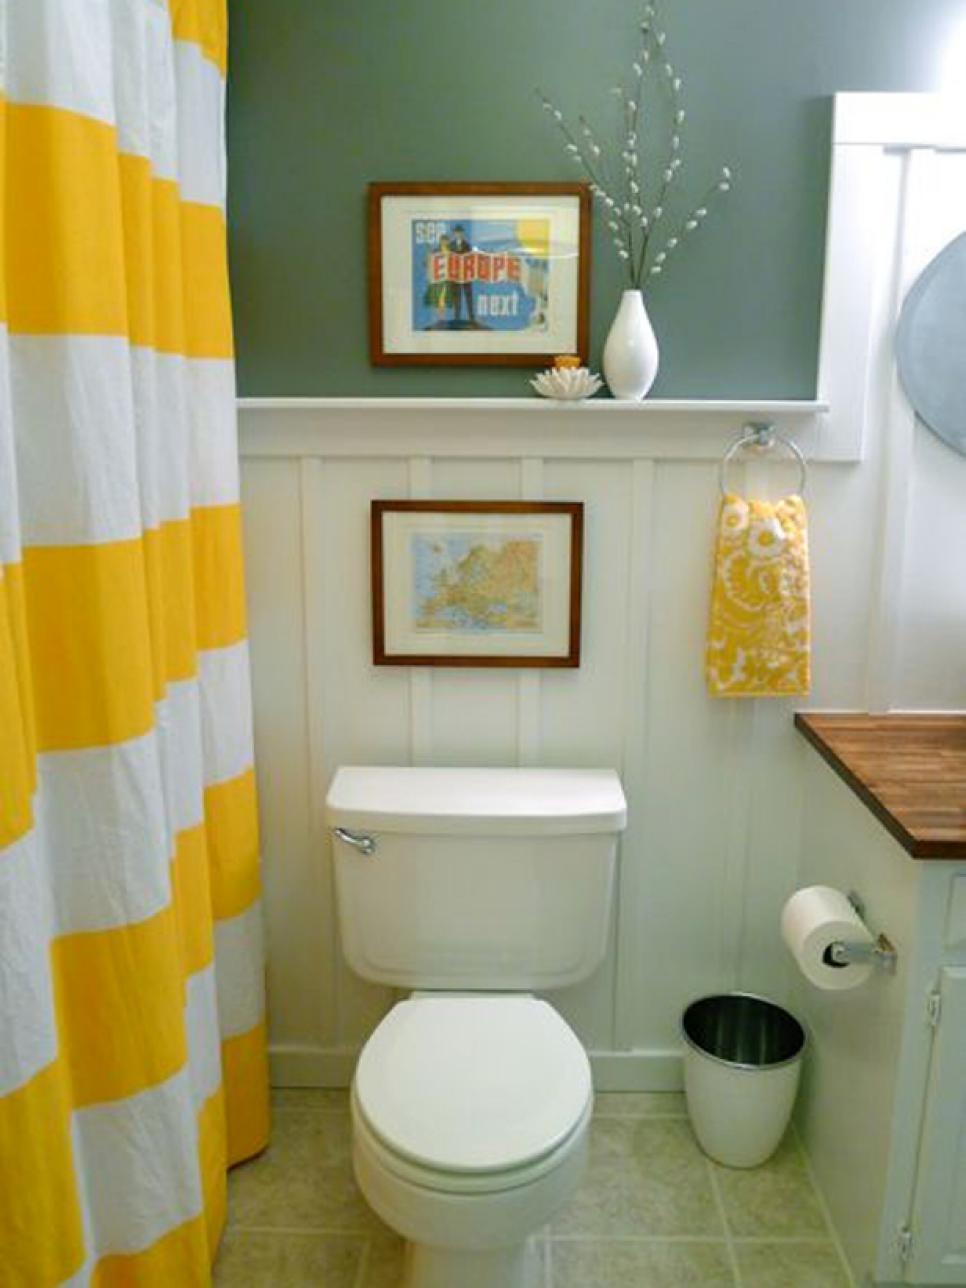 10 Most Popular Bathroom Wall Ideas On A Budget %name 2021